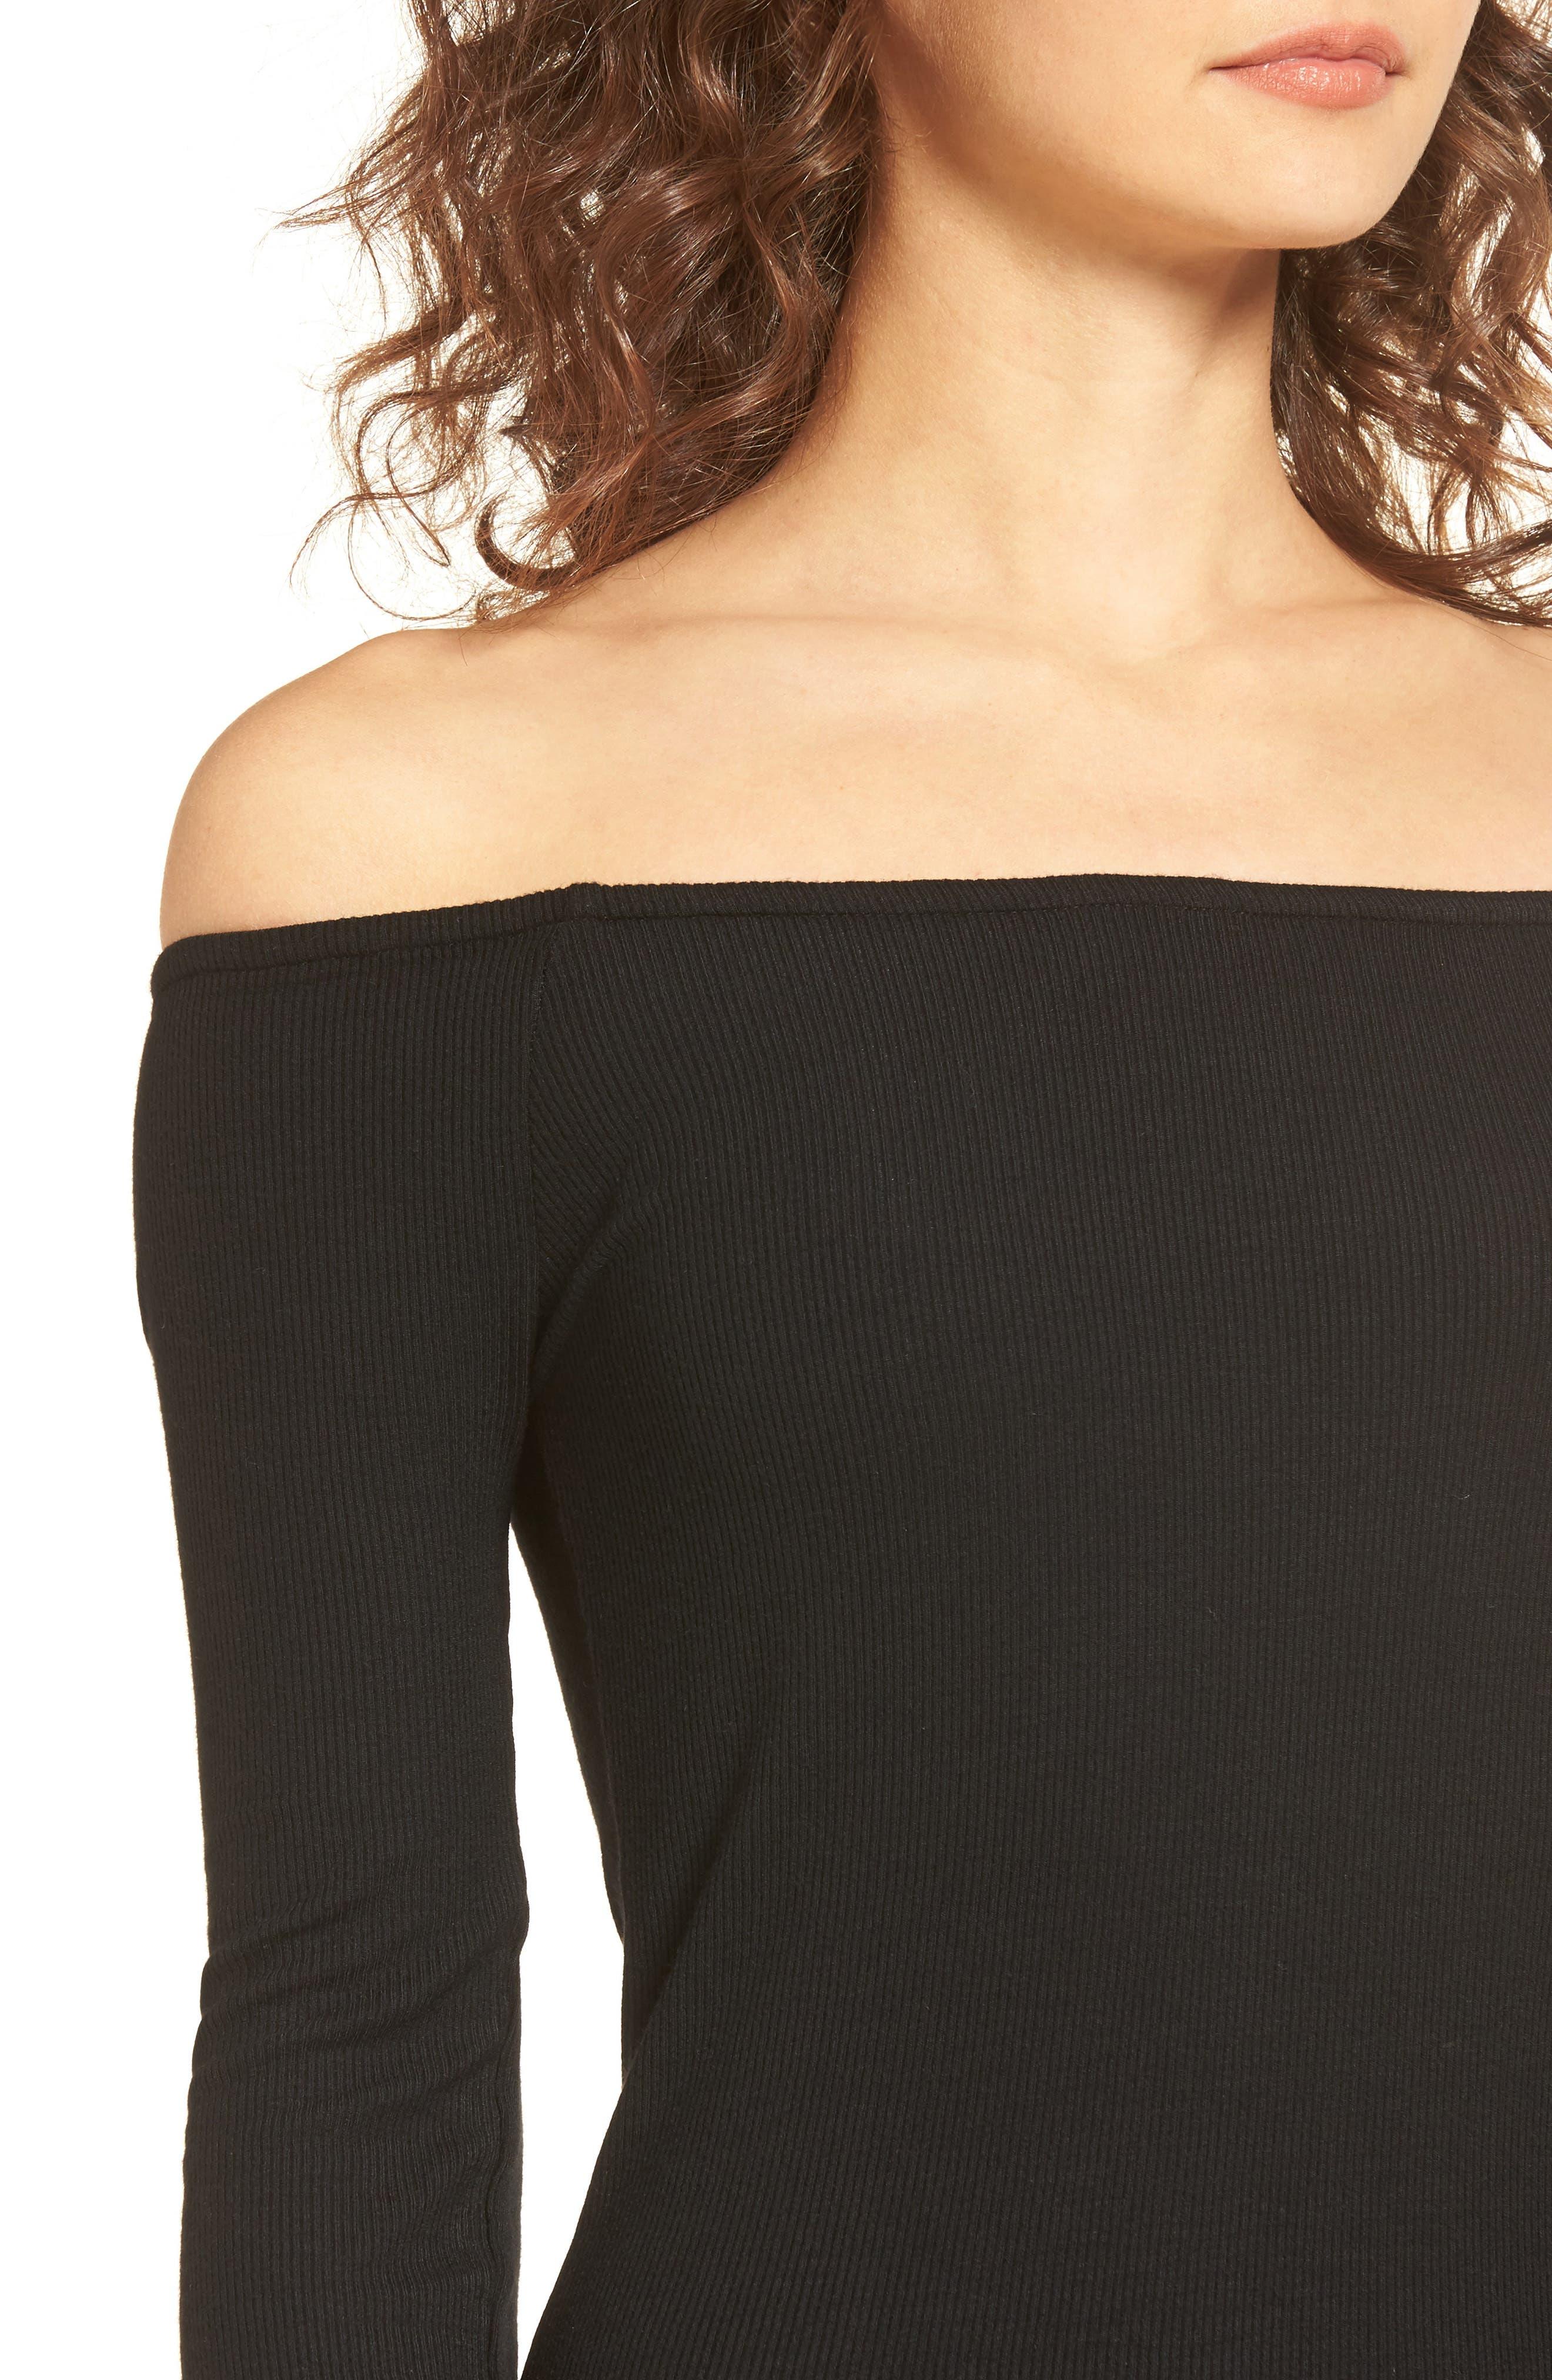 Milo Off the Shoulder Dress,                             Alternate thumbnail 4, color,                             Black